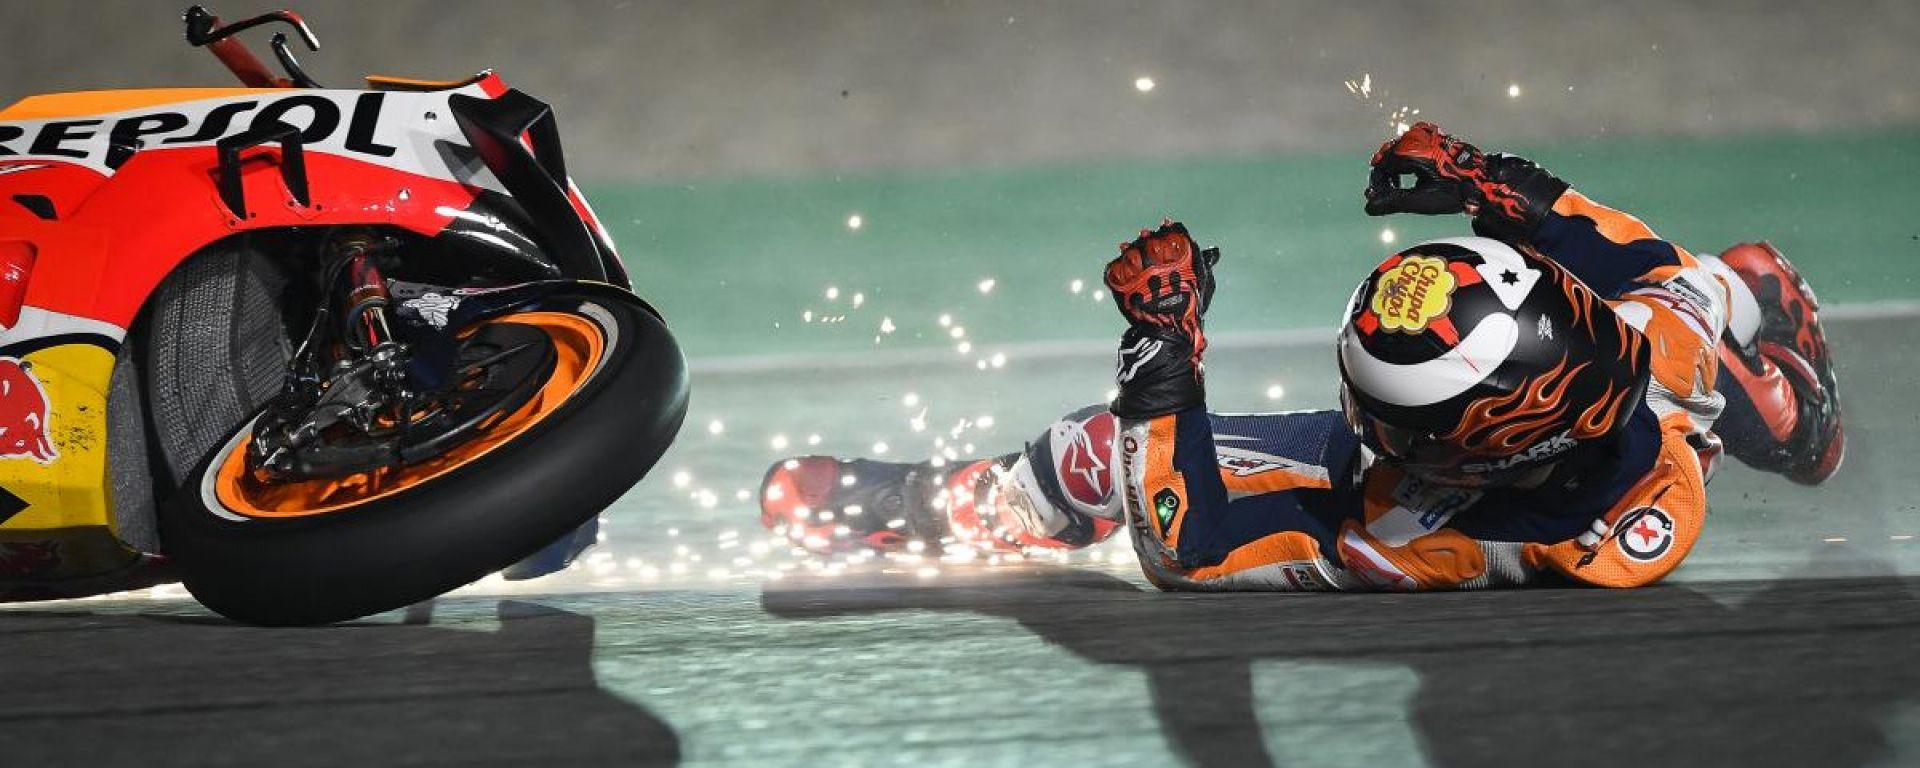 Jorge Lorenzo, che sfortuna! Costola fratturata in Qatar